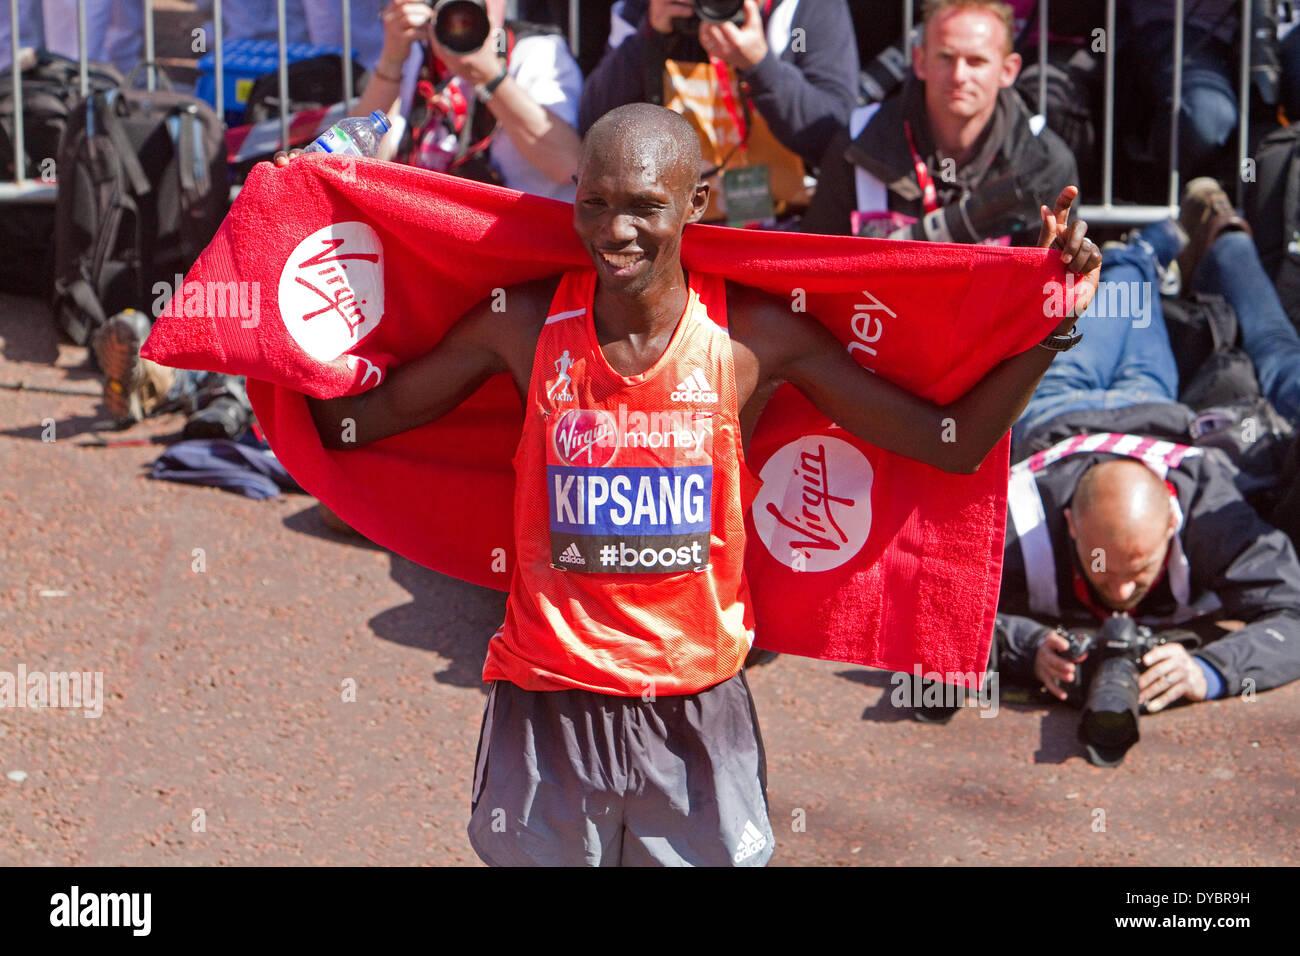 London, UK. 13th April, 2014. The winner of the Elite Mens London Marathon was Wilson Kipsang Credit:  Keith Larby/Alamy Live News - Stock Image